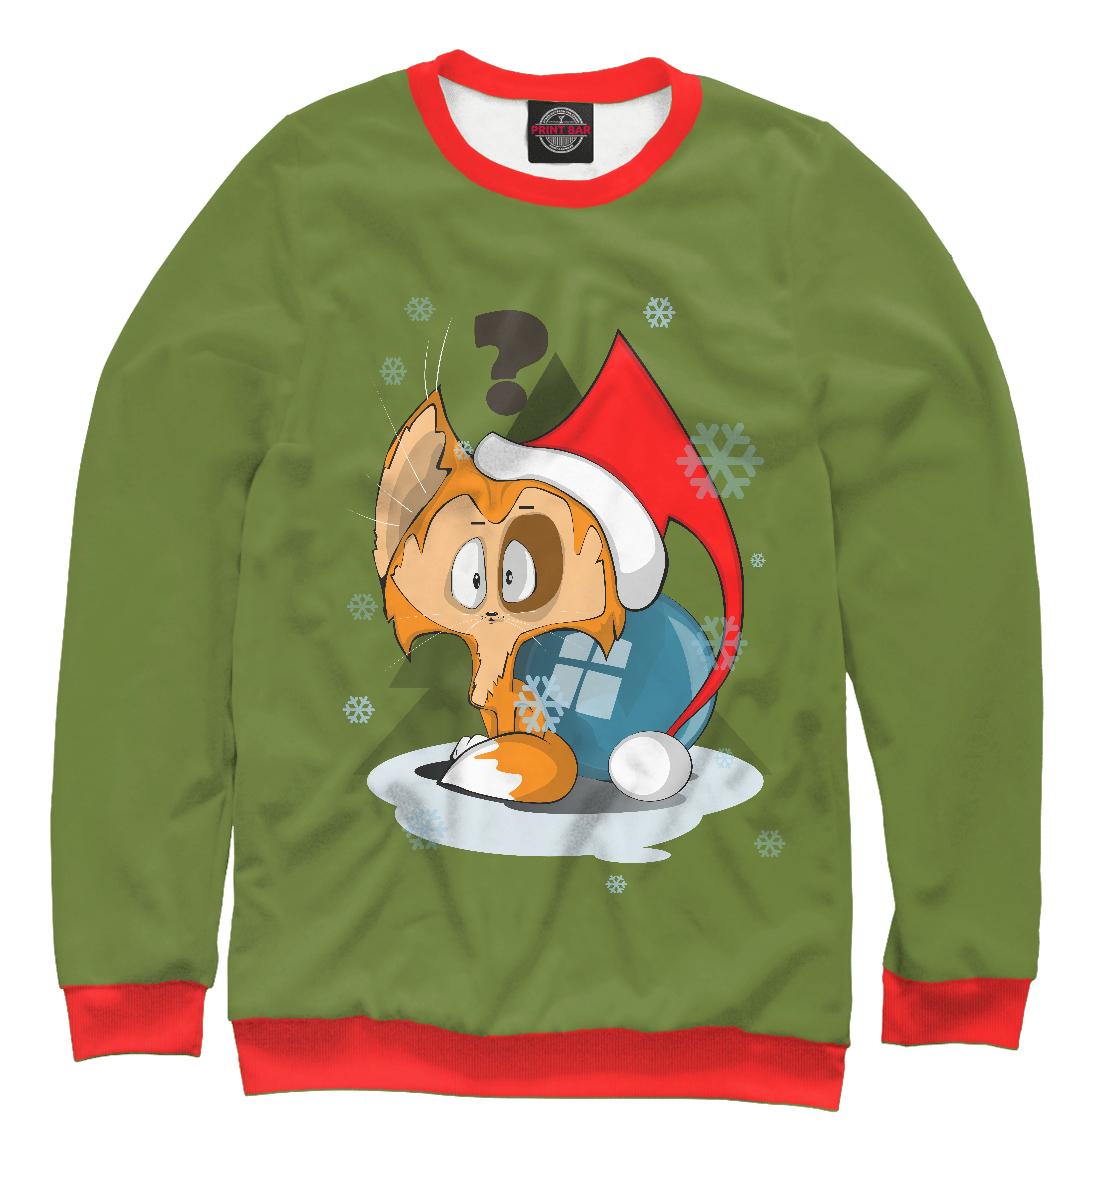 Купить Маленький Дед Мороз, Printbar, Свитшоты, CAT-896496-swi-1